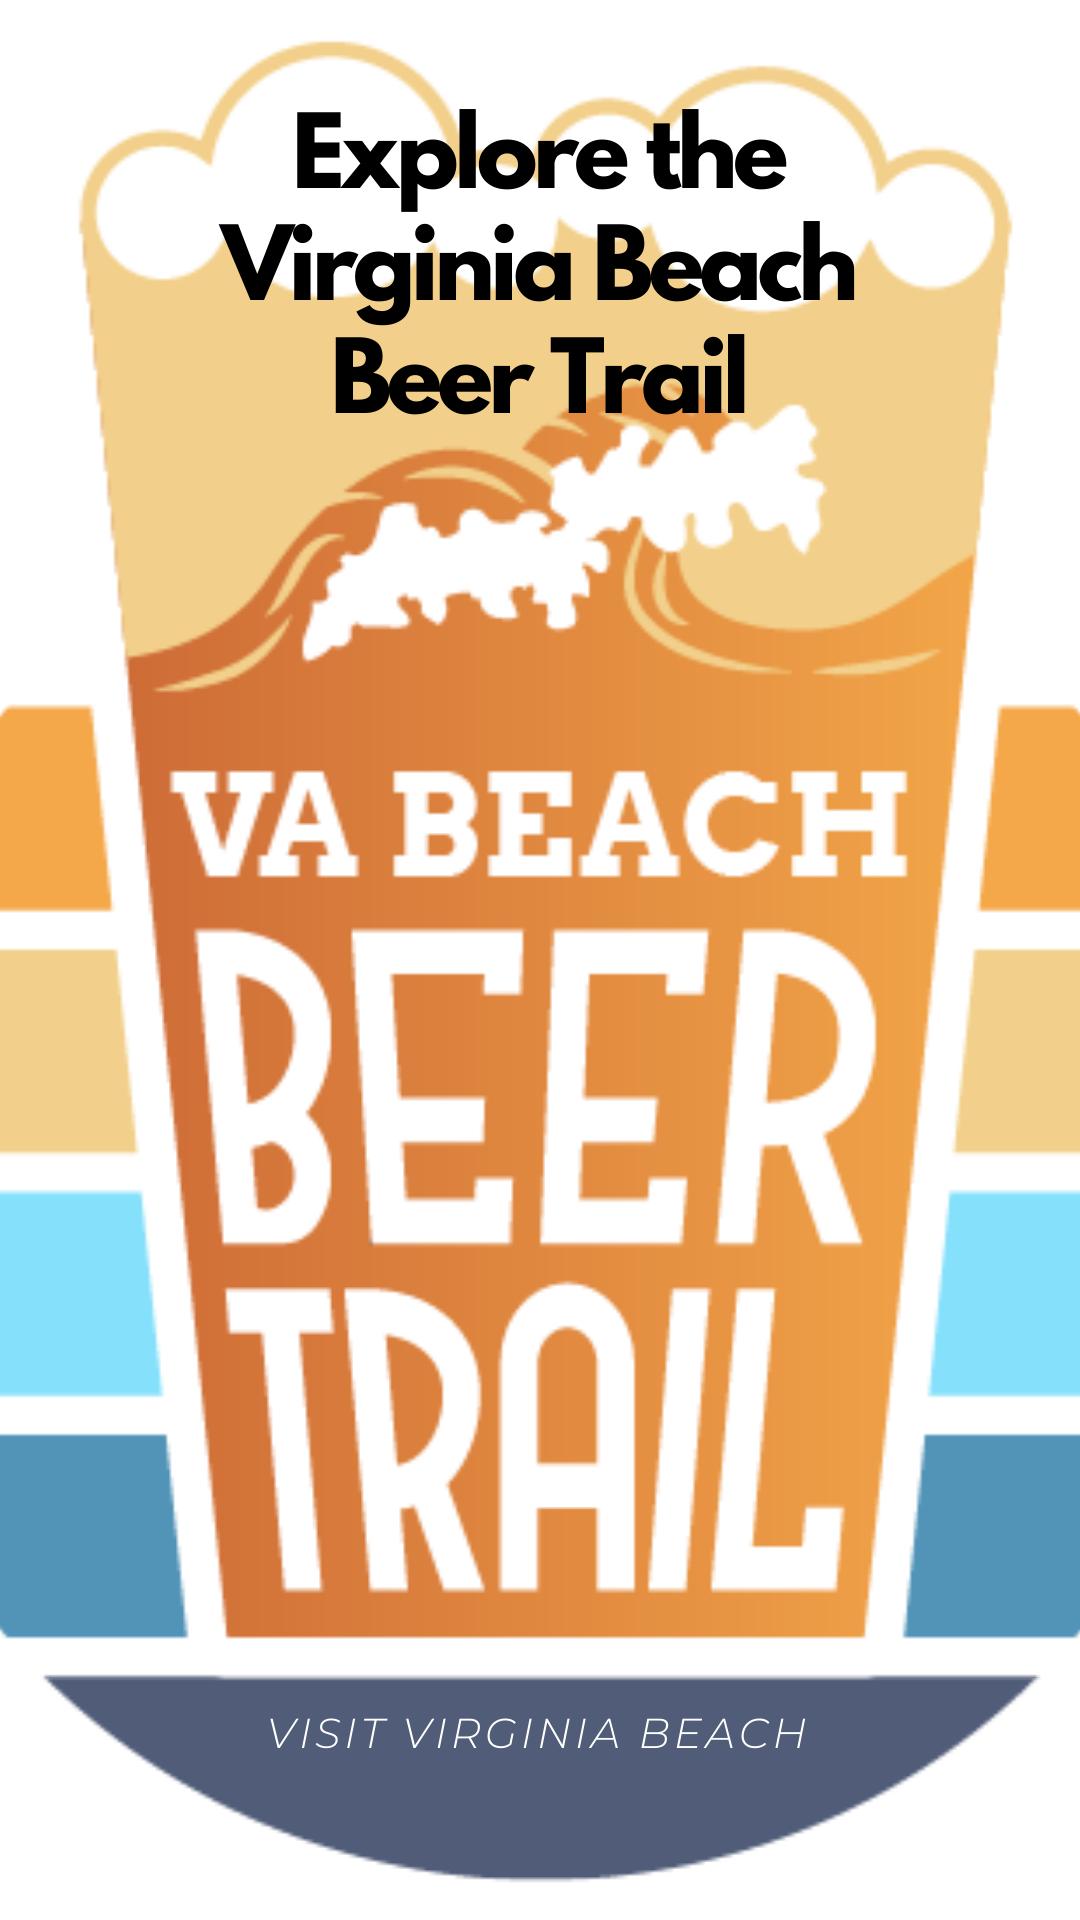 Explore The Virginia Beach Trail In 2020 Virginia Beach Travel Beer Trail Visit Virginia Beach